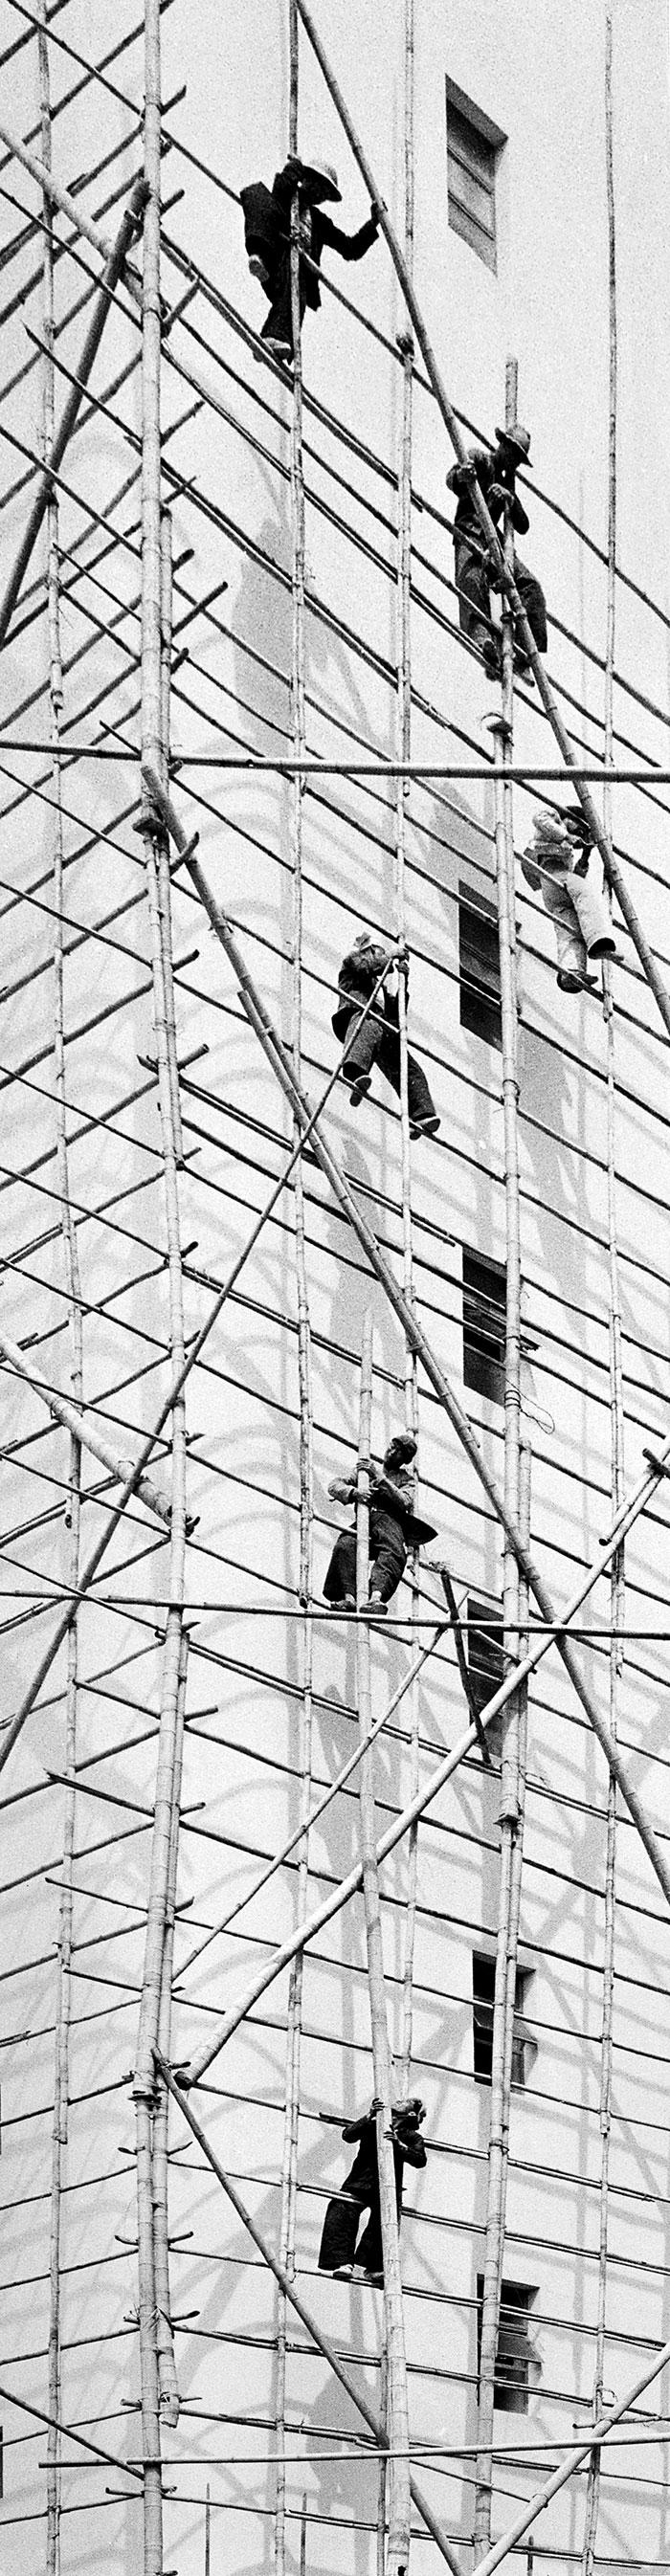 street-photography-hong-kong-memoir-fan-ho-43